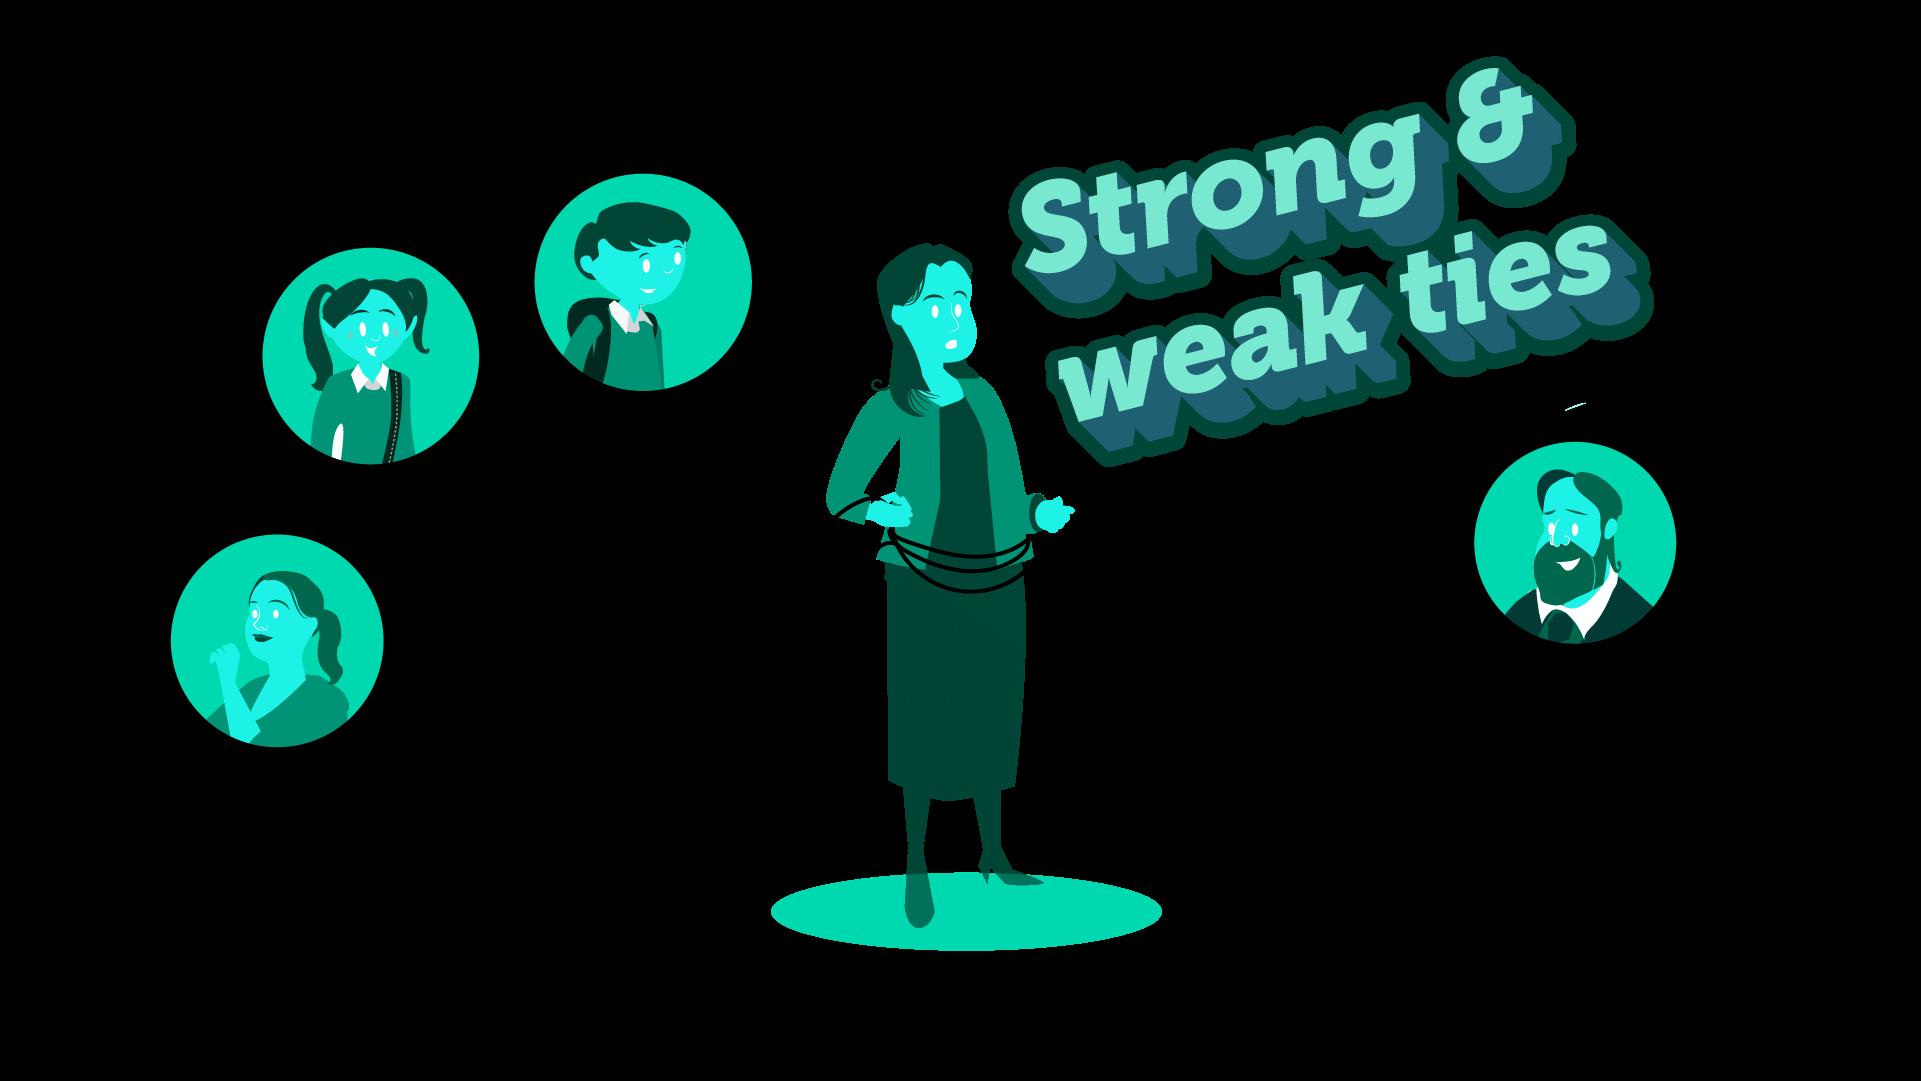 strong and weak ties